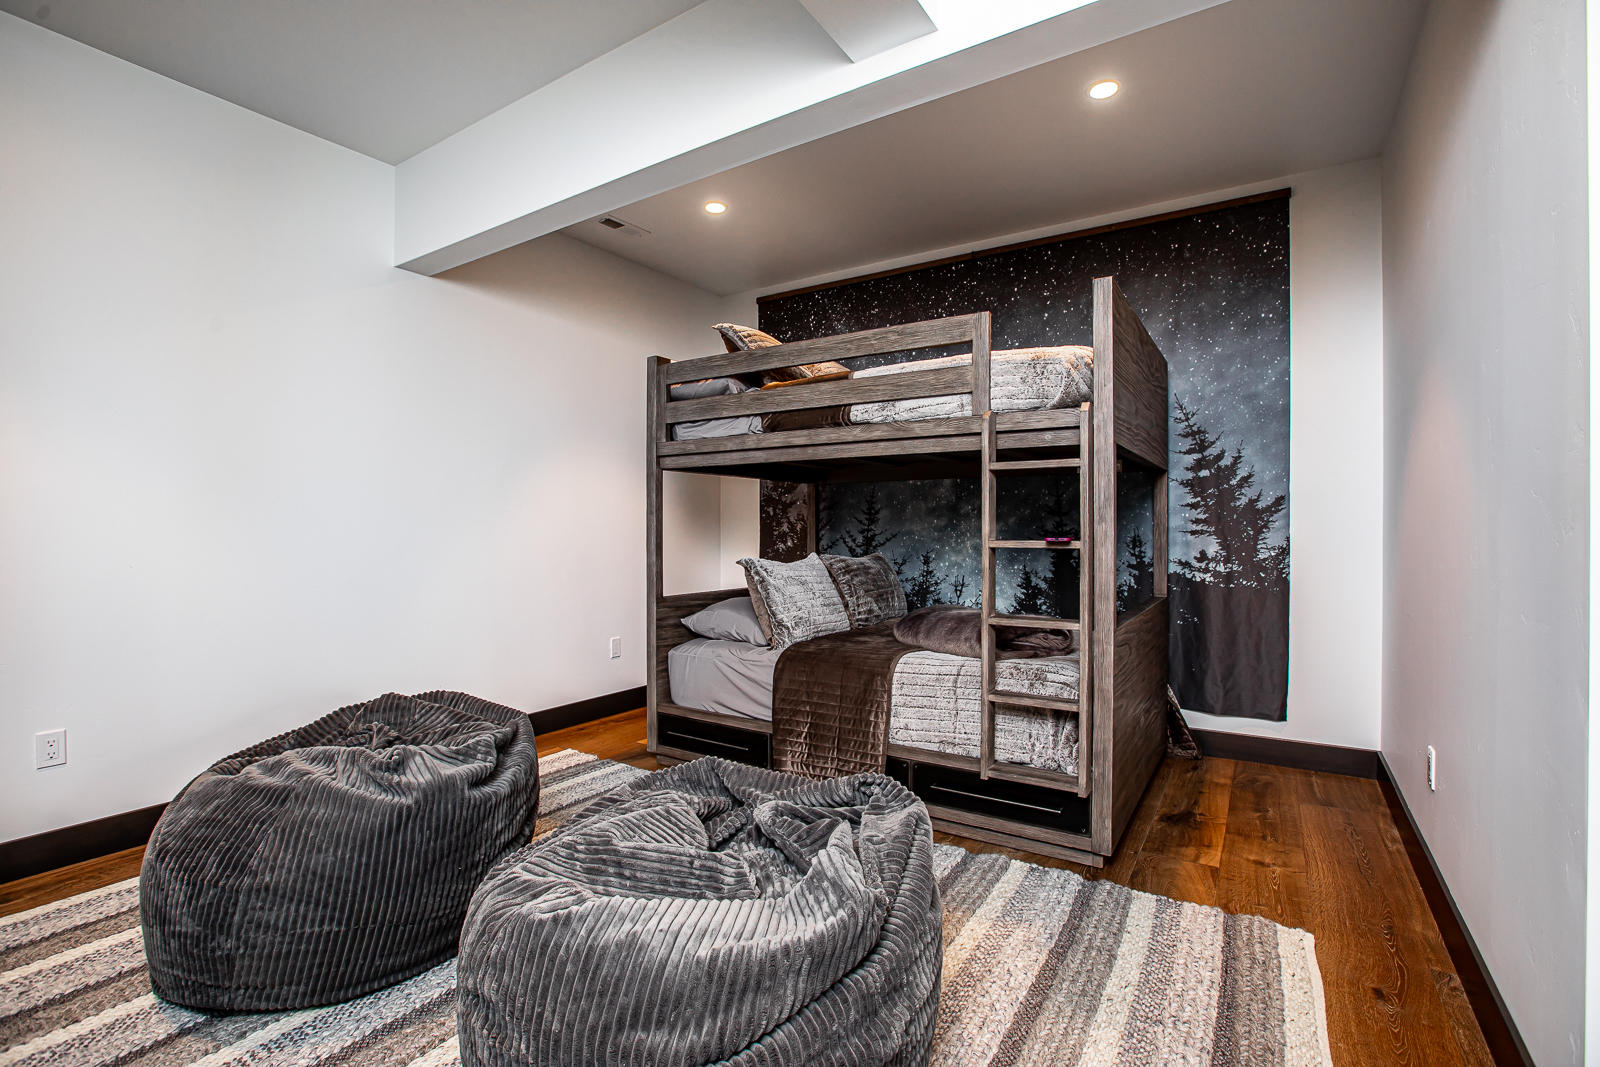 Bed 4 Bunk Area